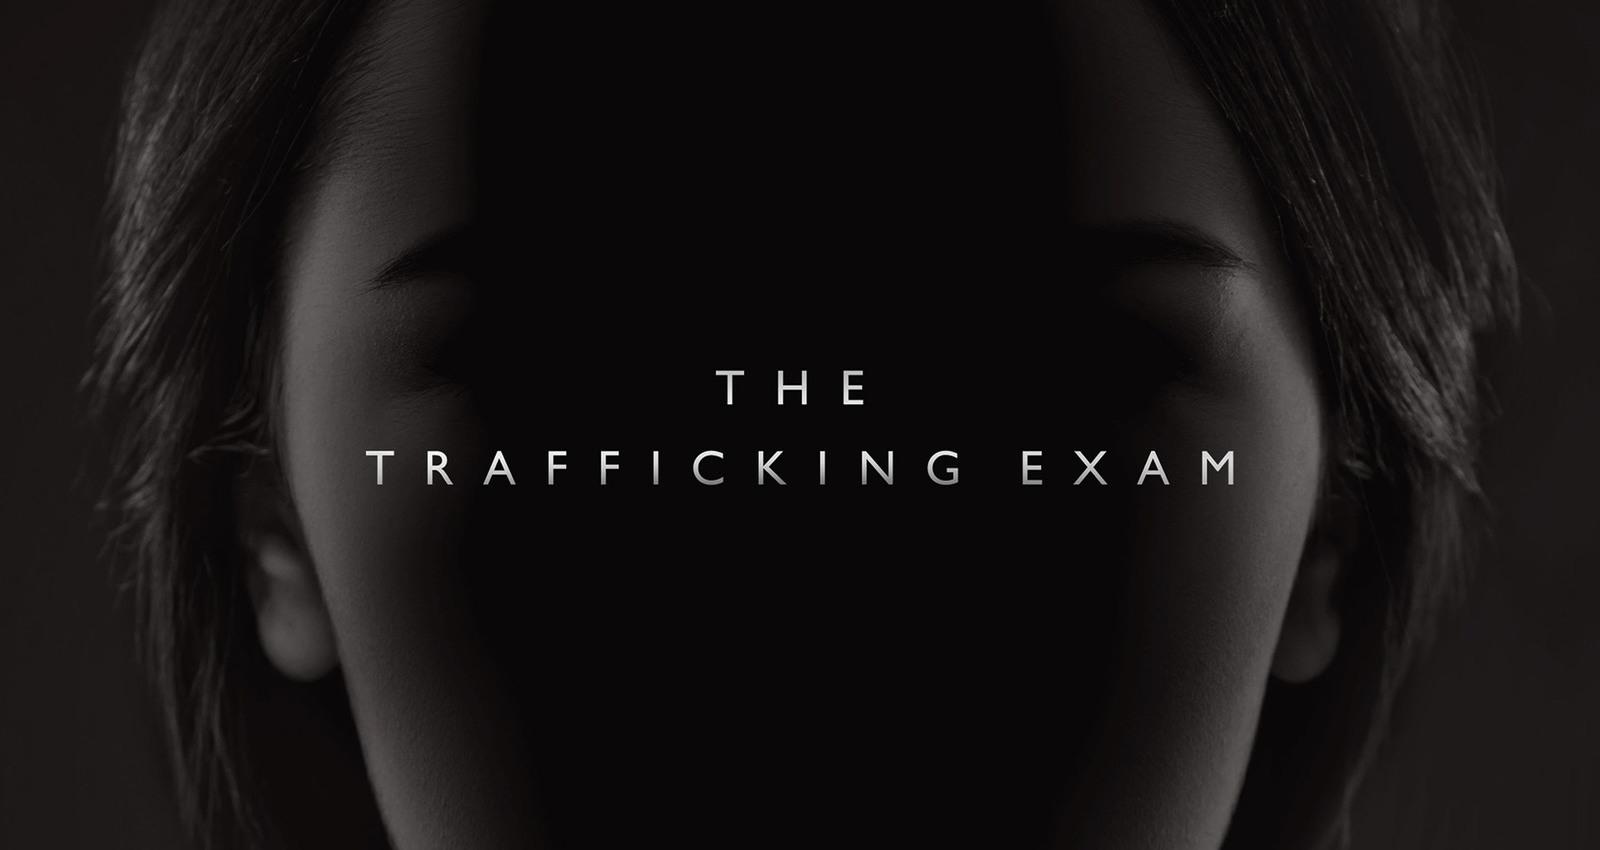 The Anti-Trafficking Exam